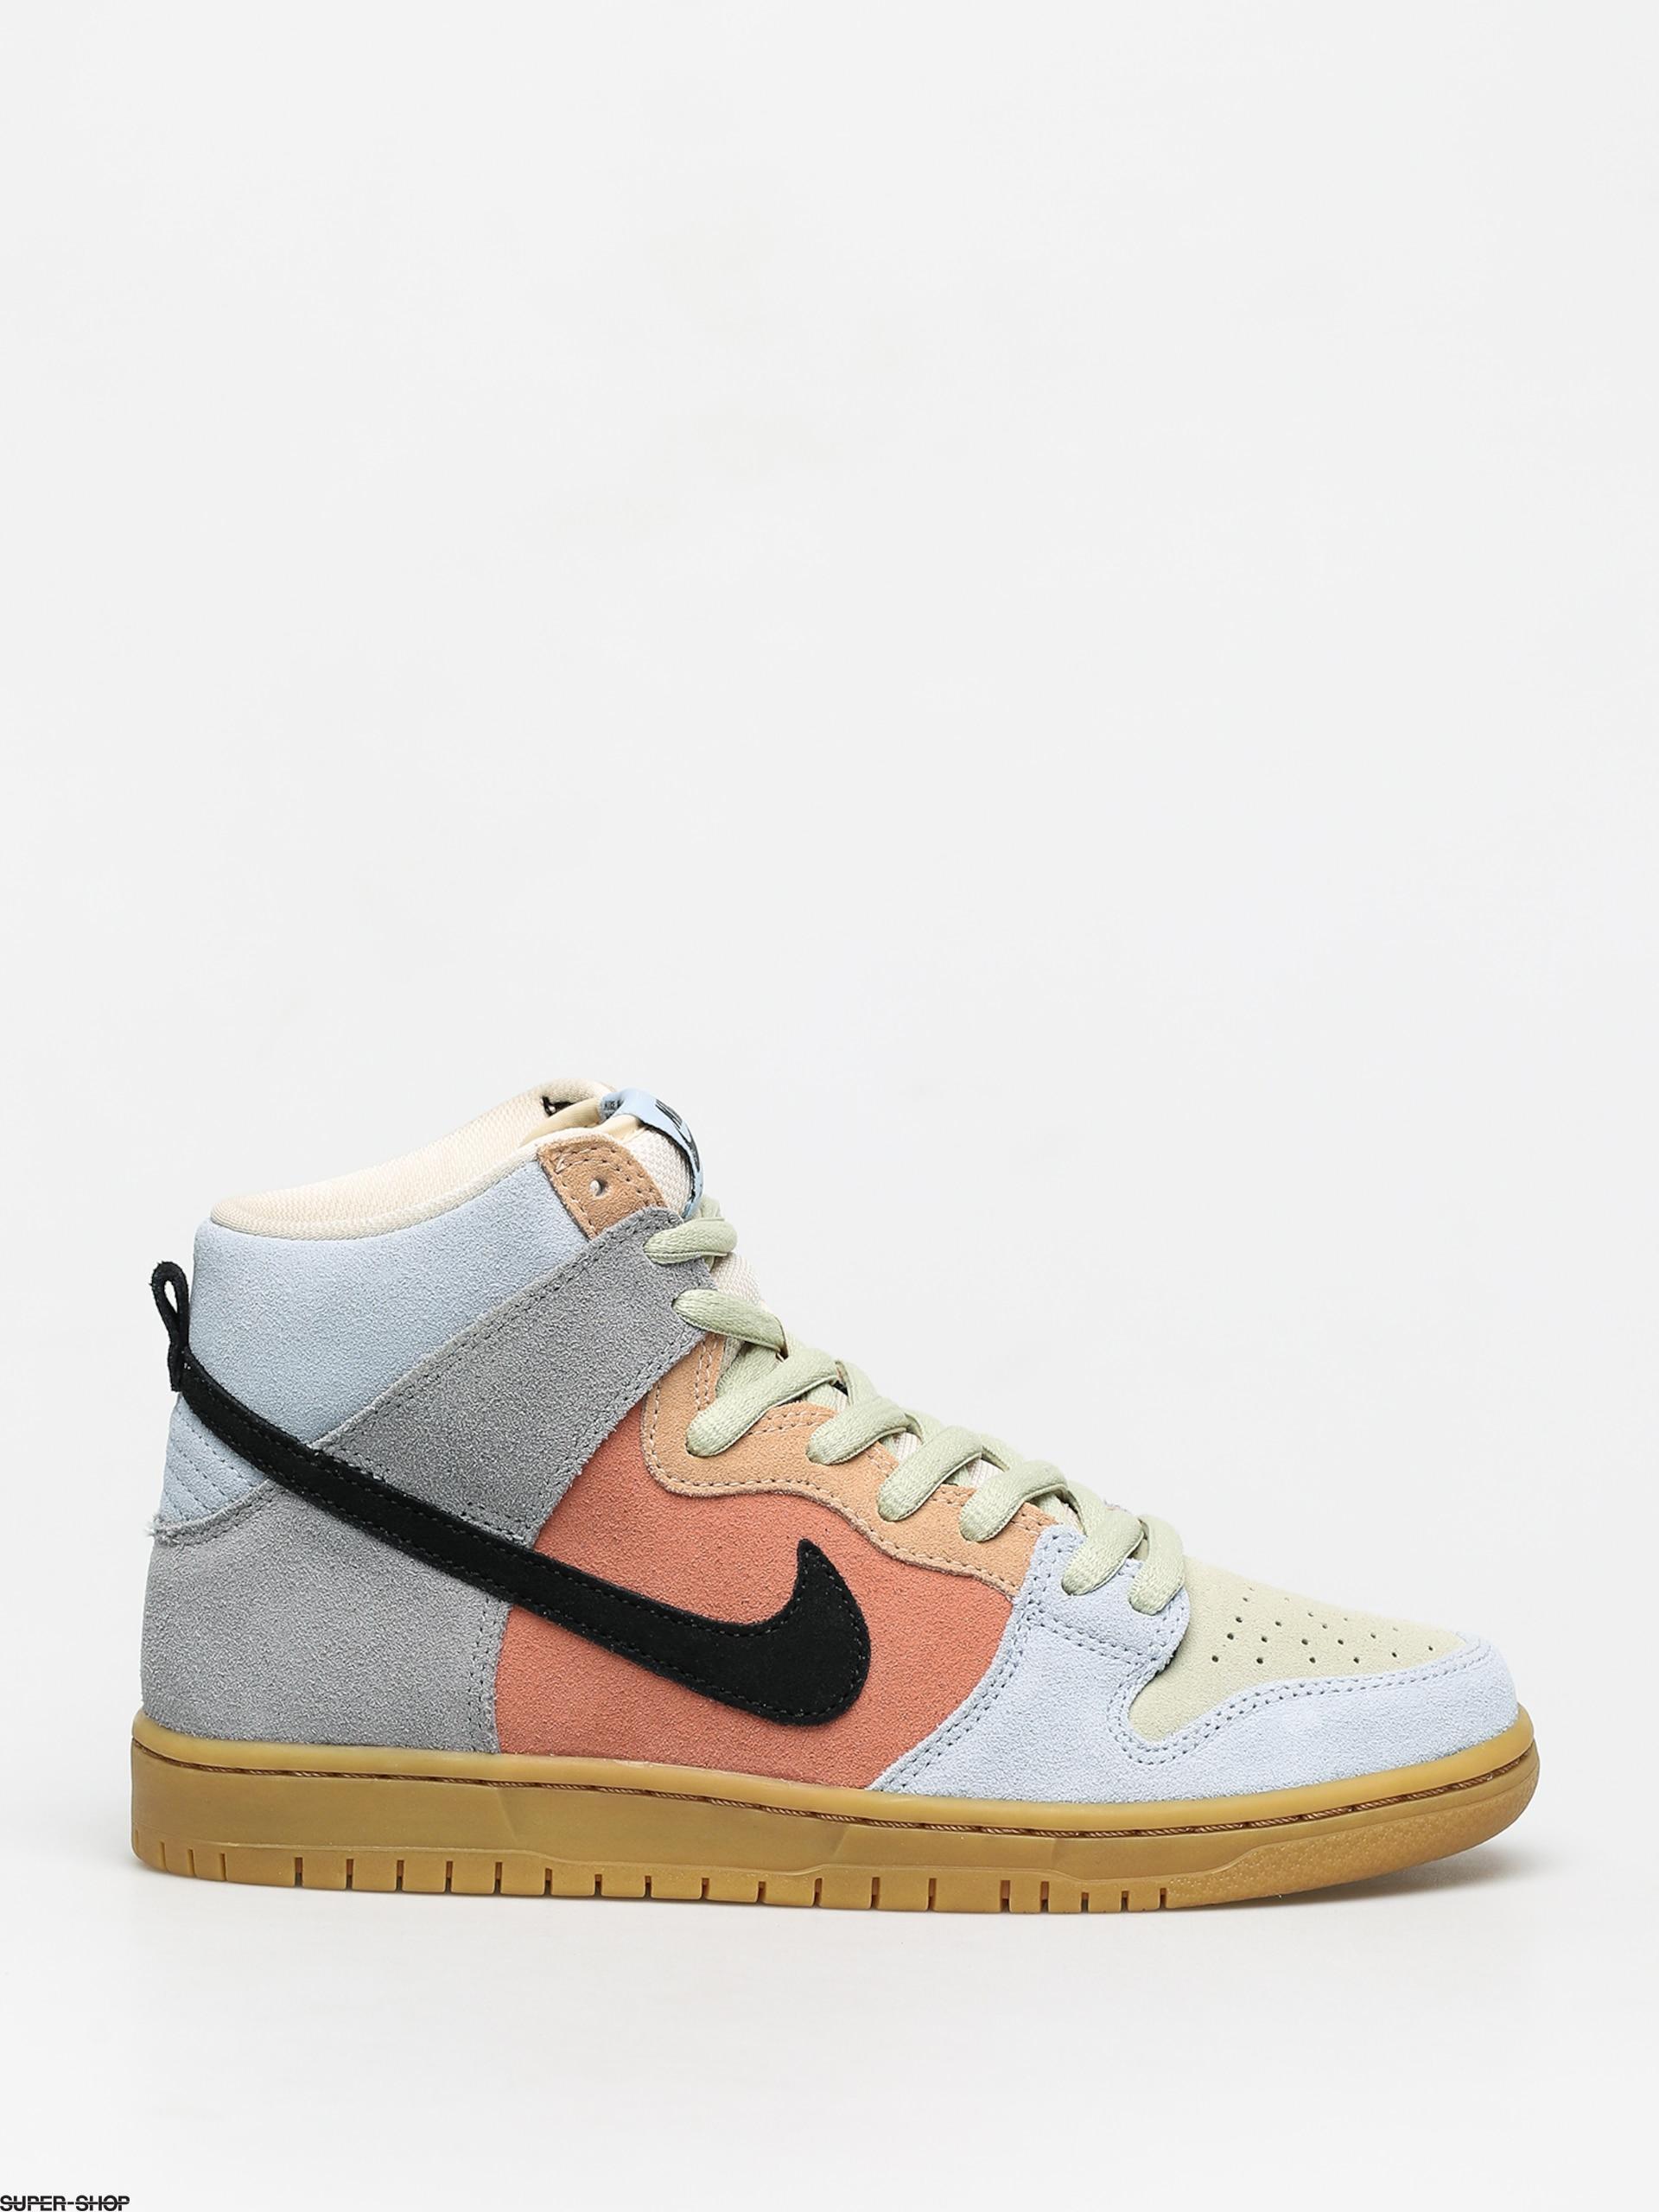 8 Best Nike SB Dunks images | Nike sb